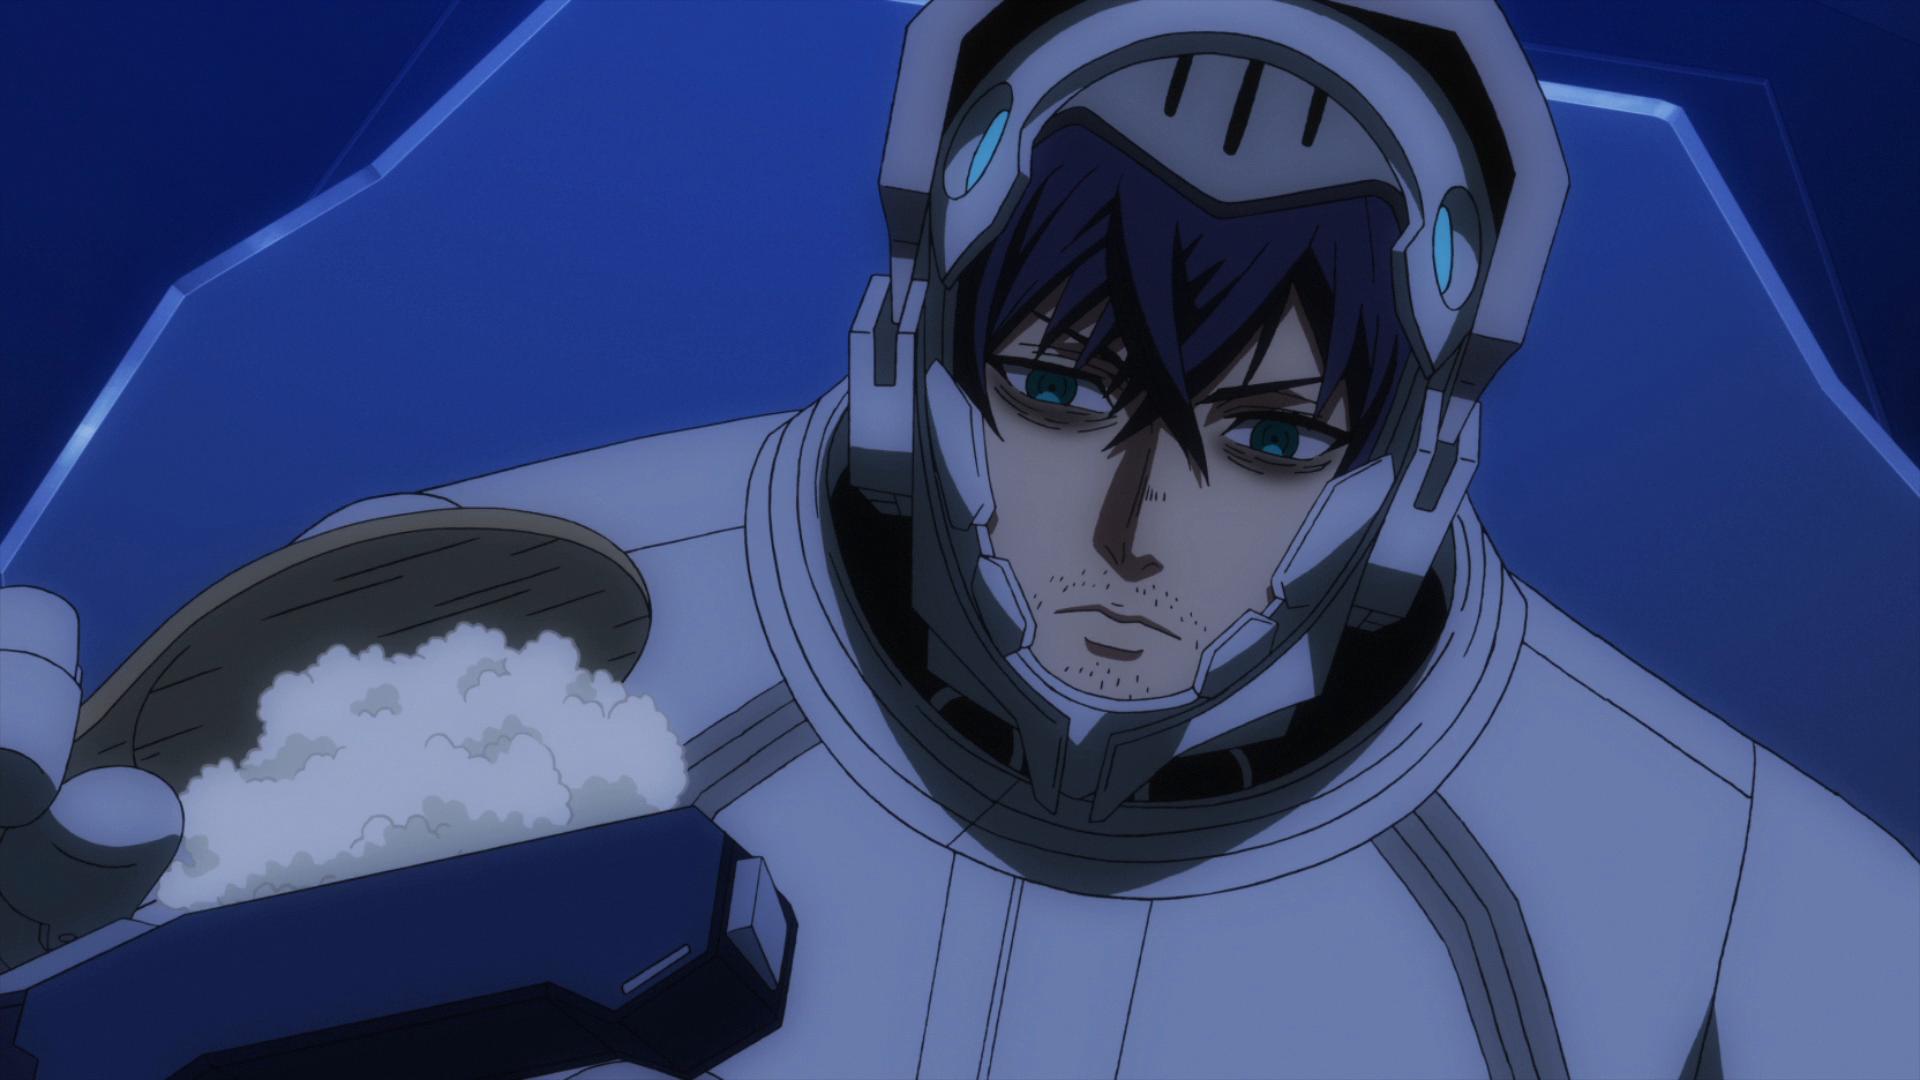 [Golumpa] Space Battleship Tiramisu S2 - 01 (Uchuu Senkan